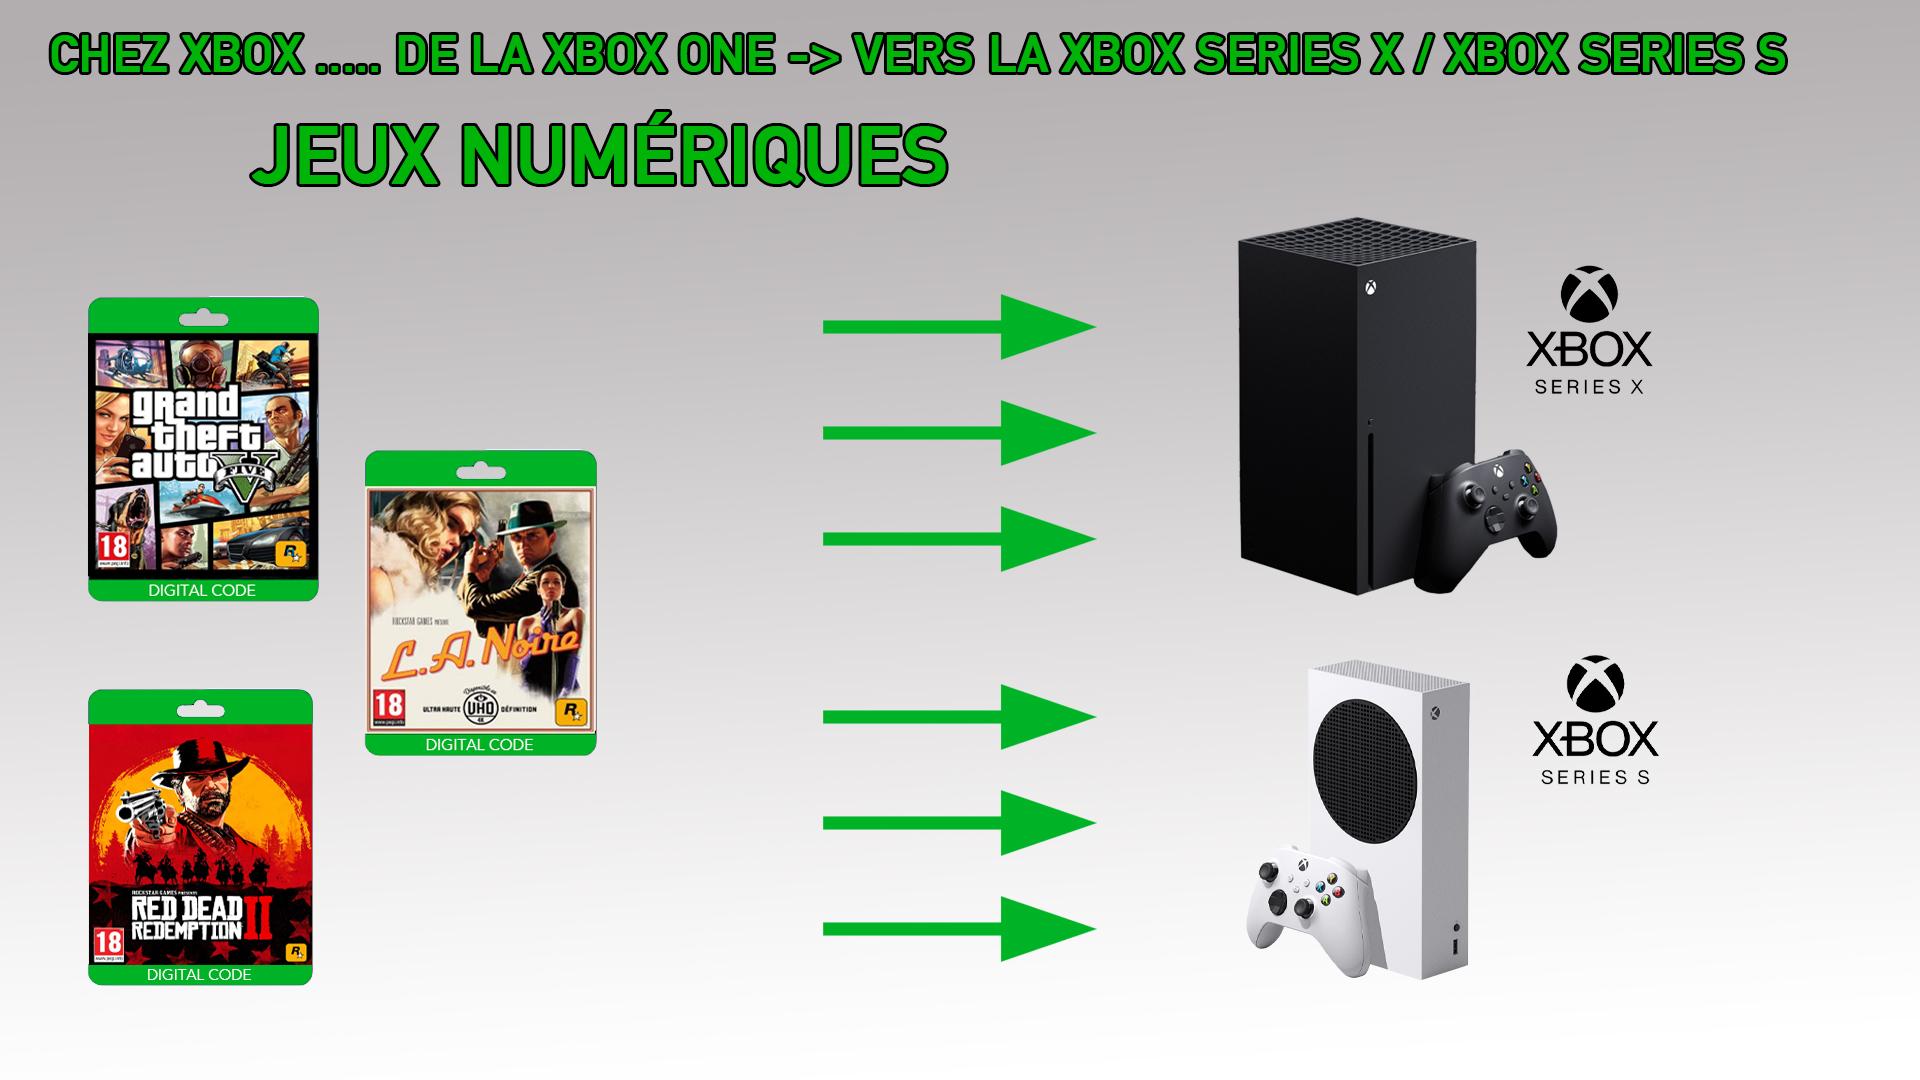 bilan-xbox-jeux-rockstar-games-numeriques